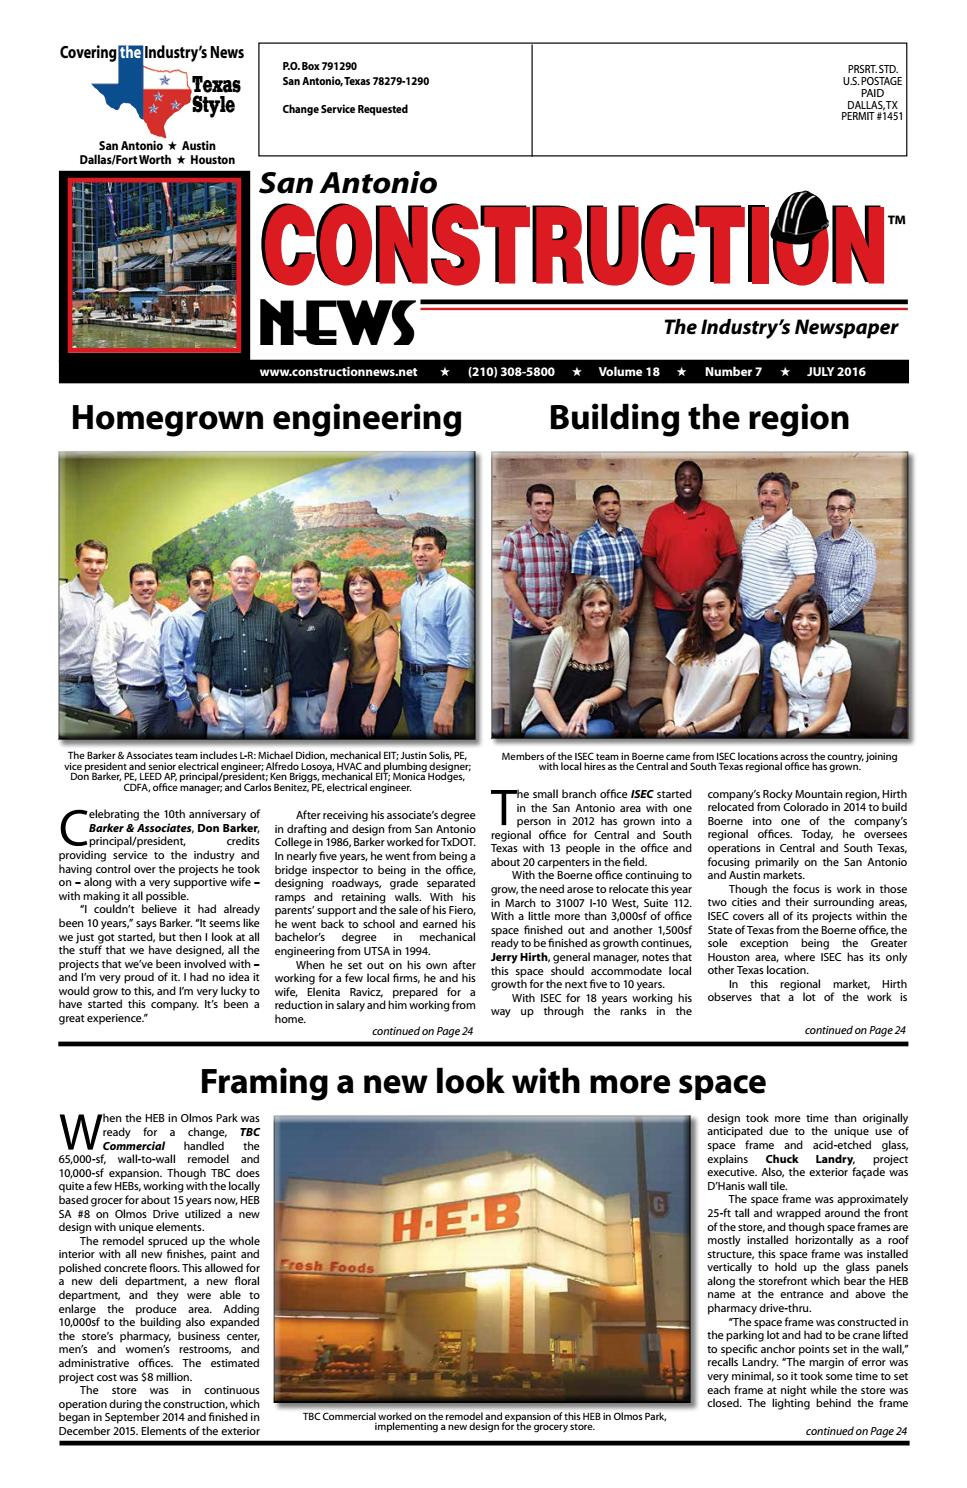 San Antonio Construction News July 2016 By Construction